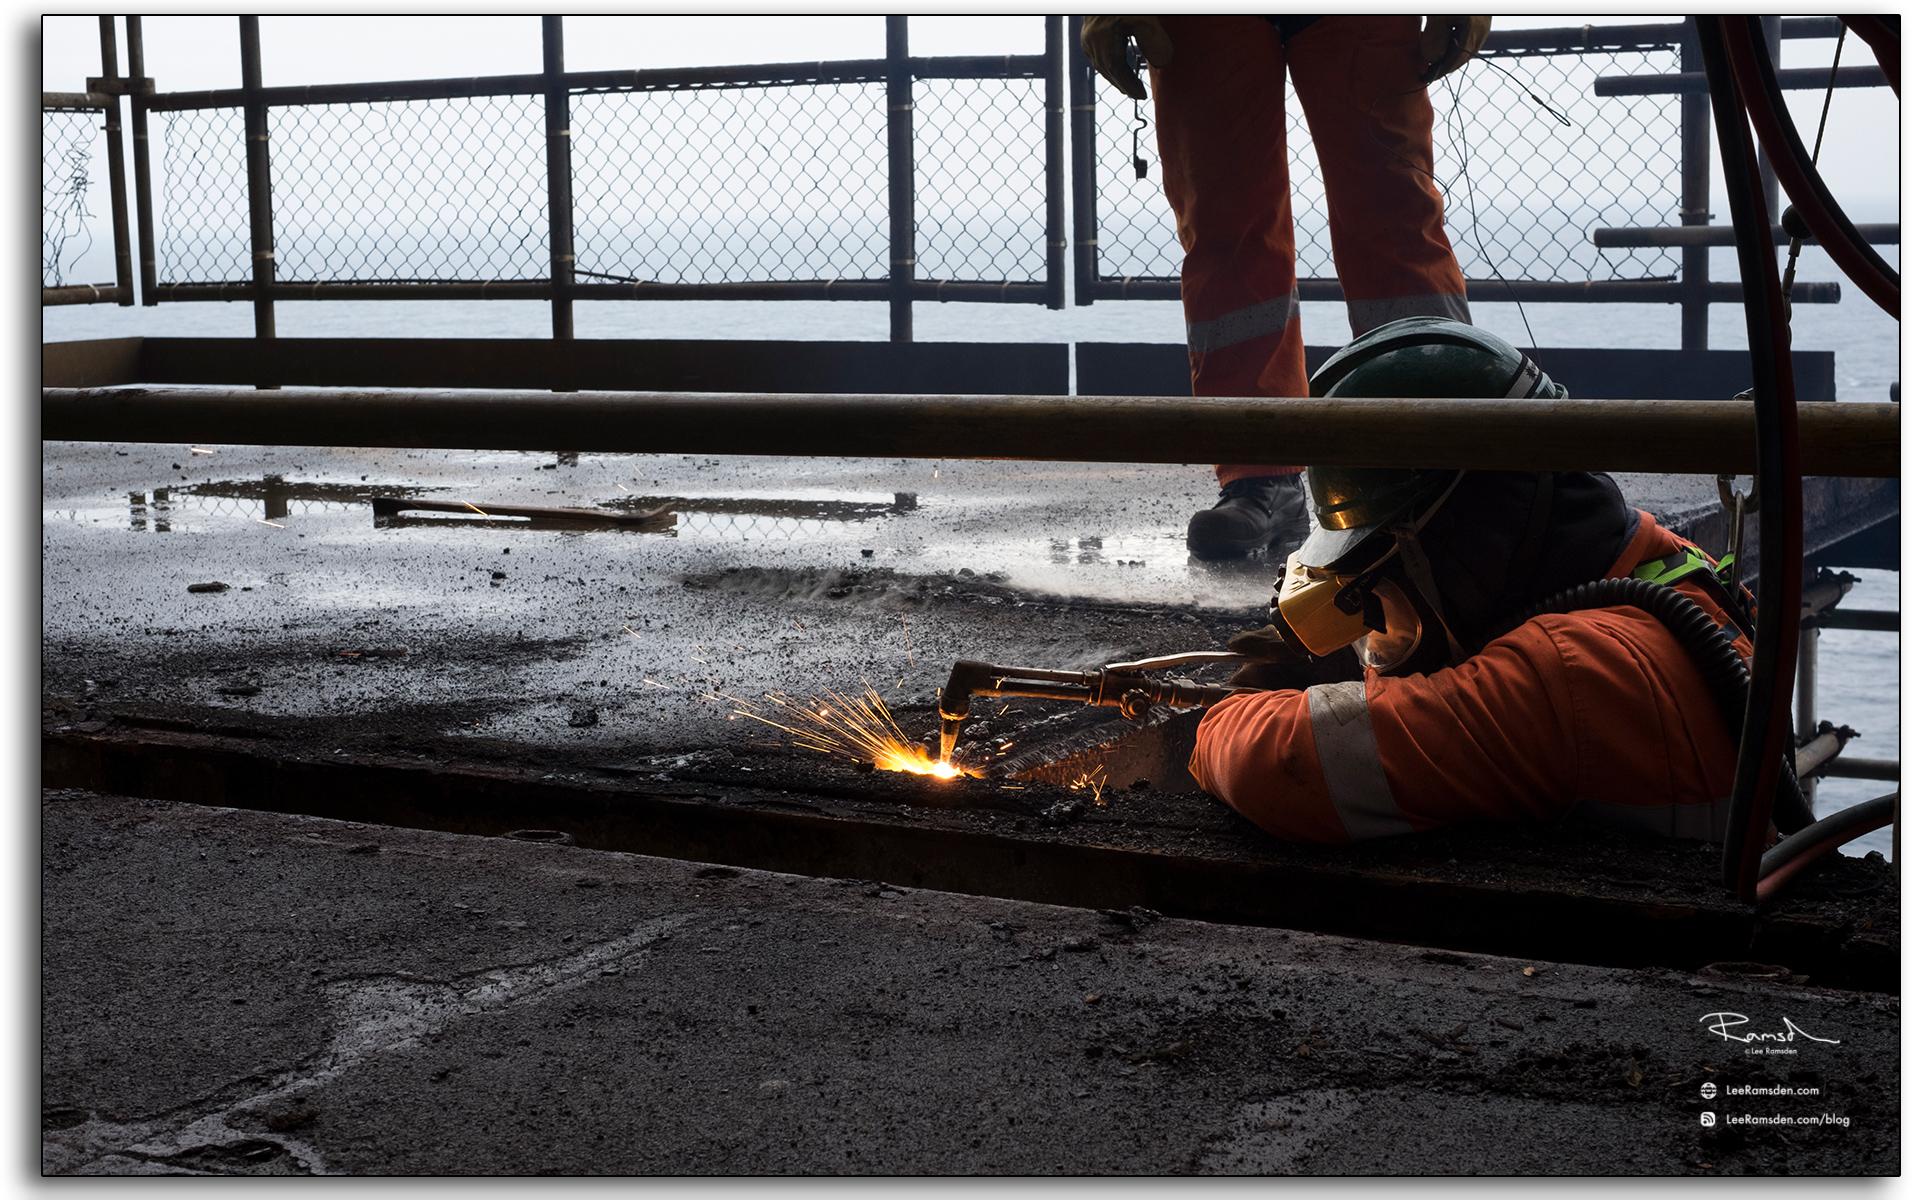 blog, Rig burning, welding, oxygen, acetylene, cutting, BP Miller, Decommissioning, industrial, removal, Saipem, Petrofac, BP, Lee Ramsden, hotwork 03